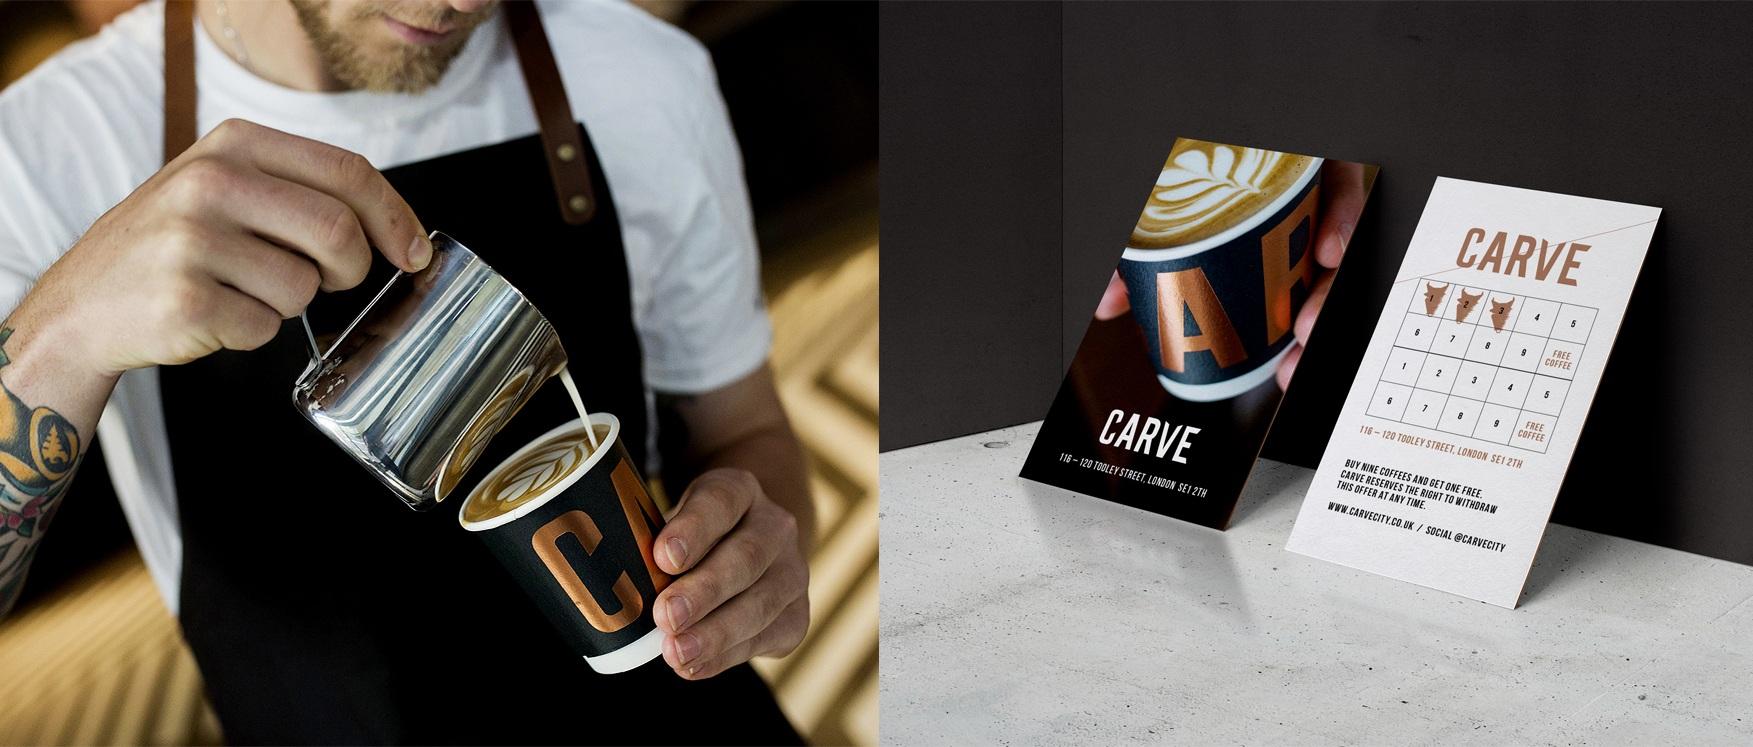 Carve+17.jpg